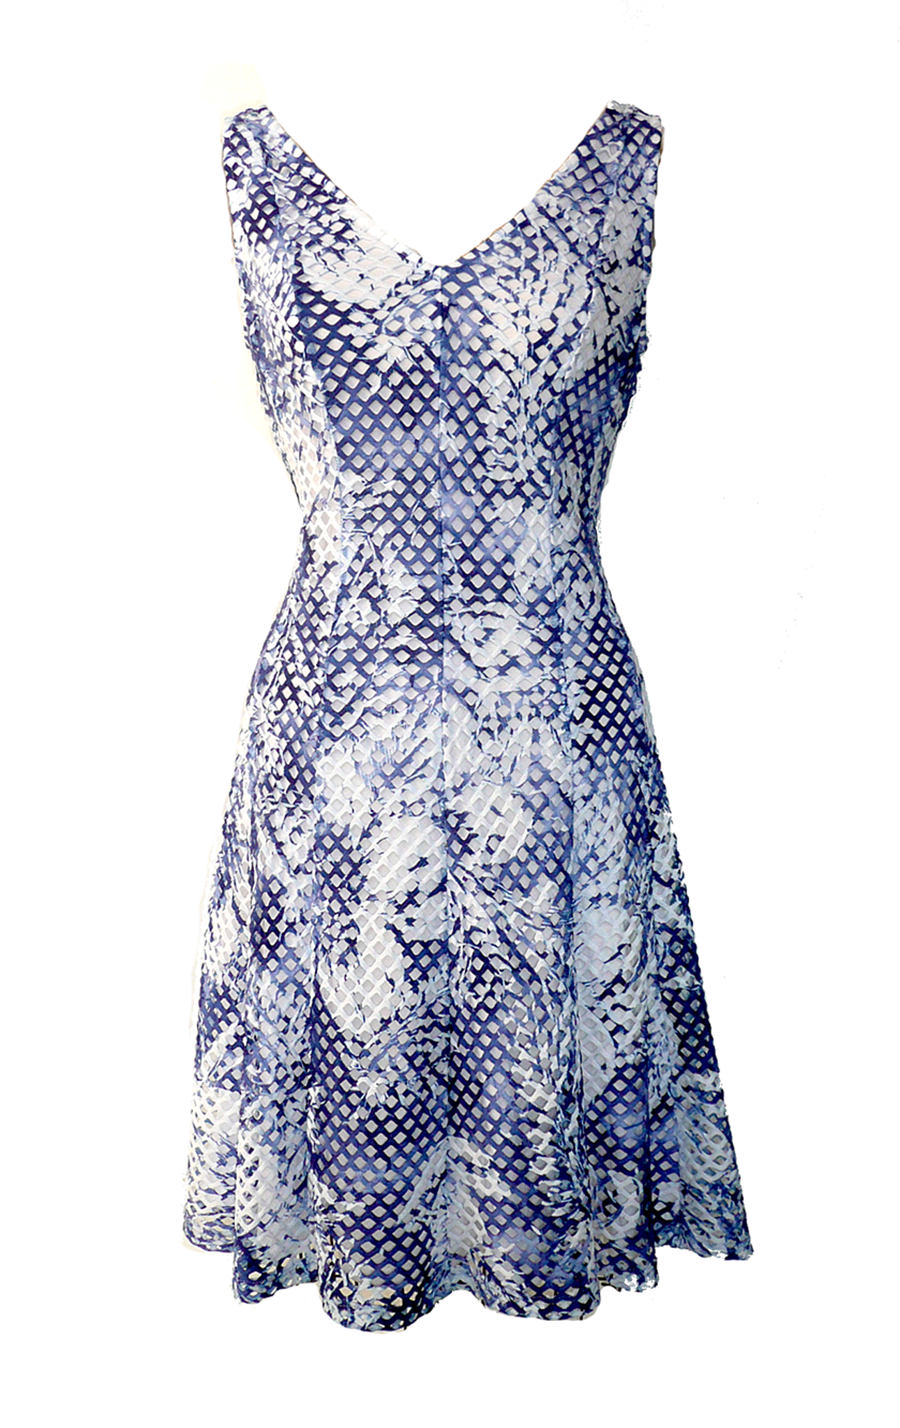 dress open lattice print.png